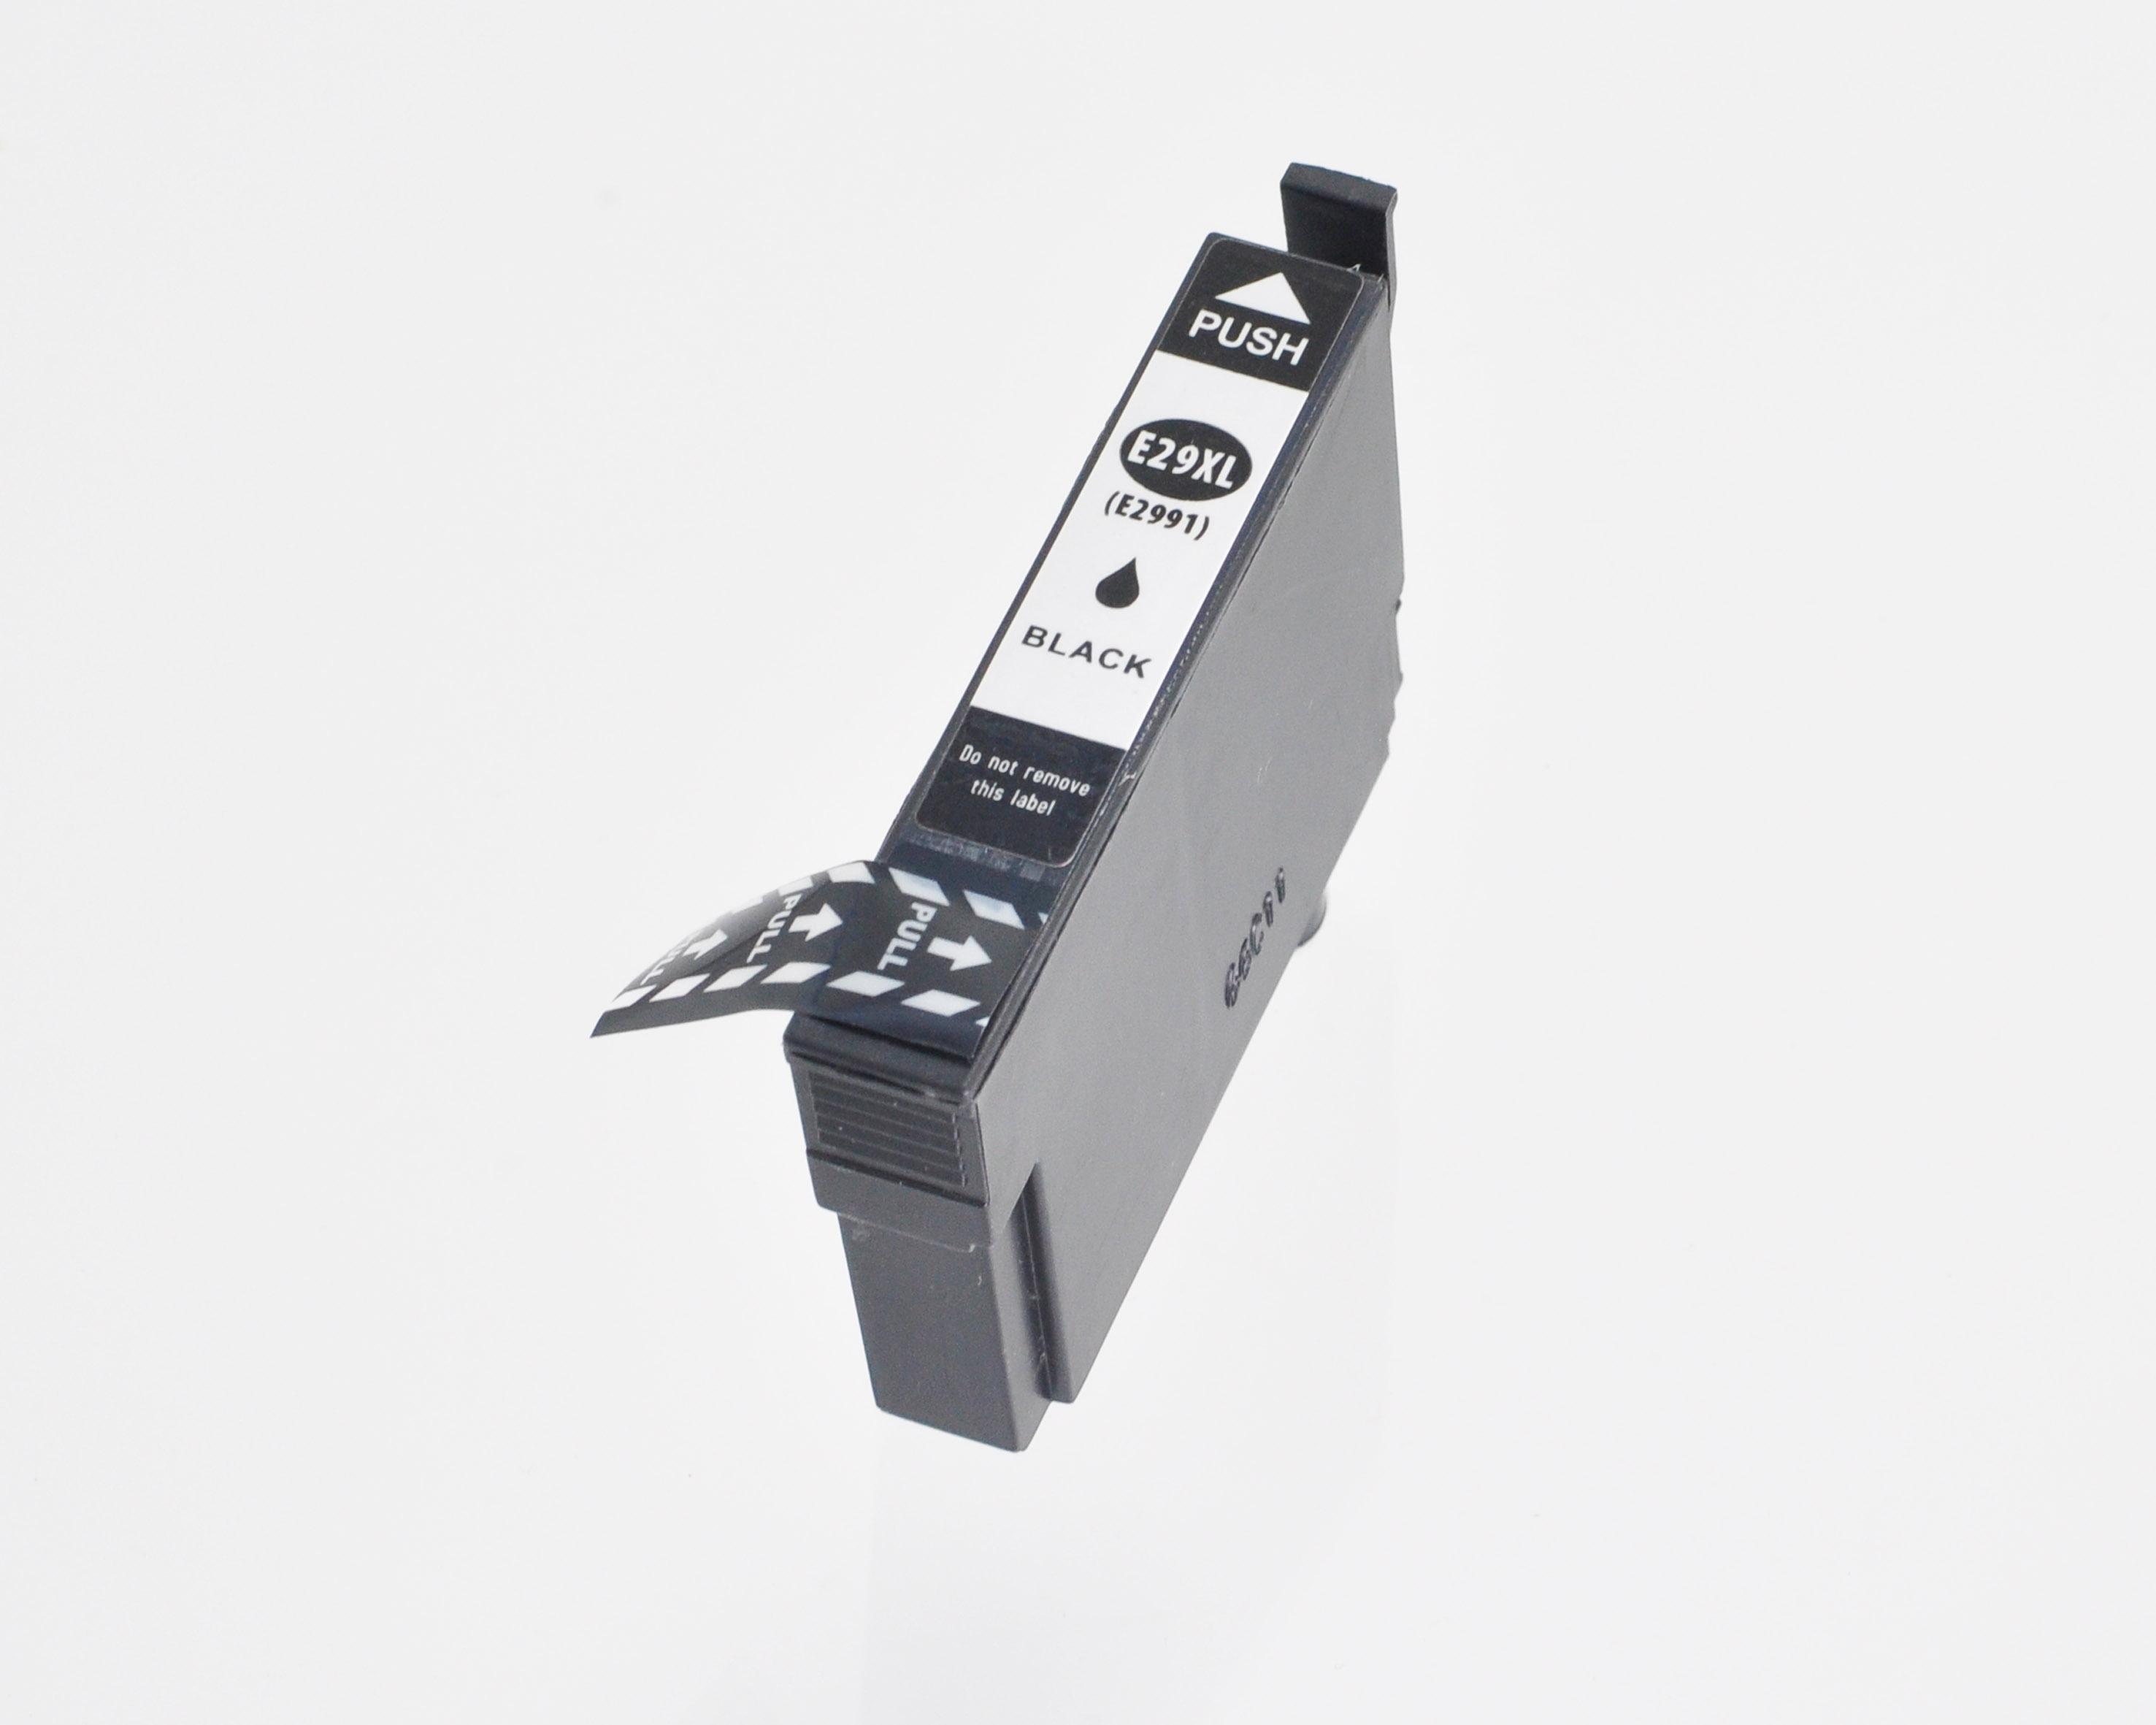 Comp Epson T29914010 Inkjet